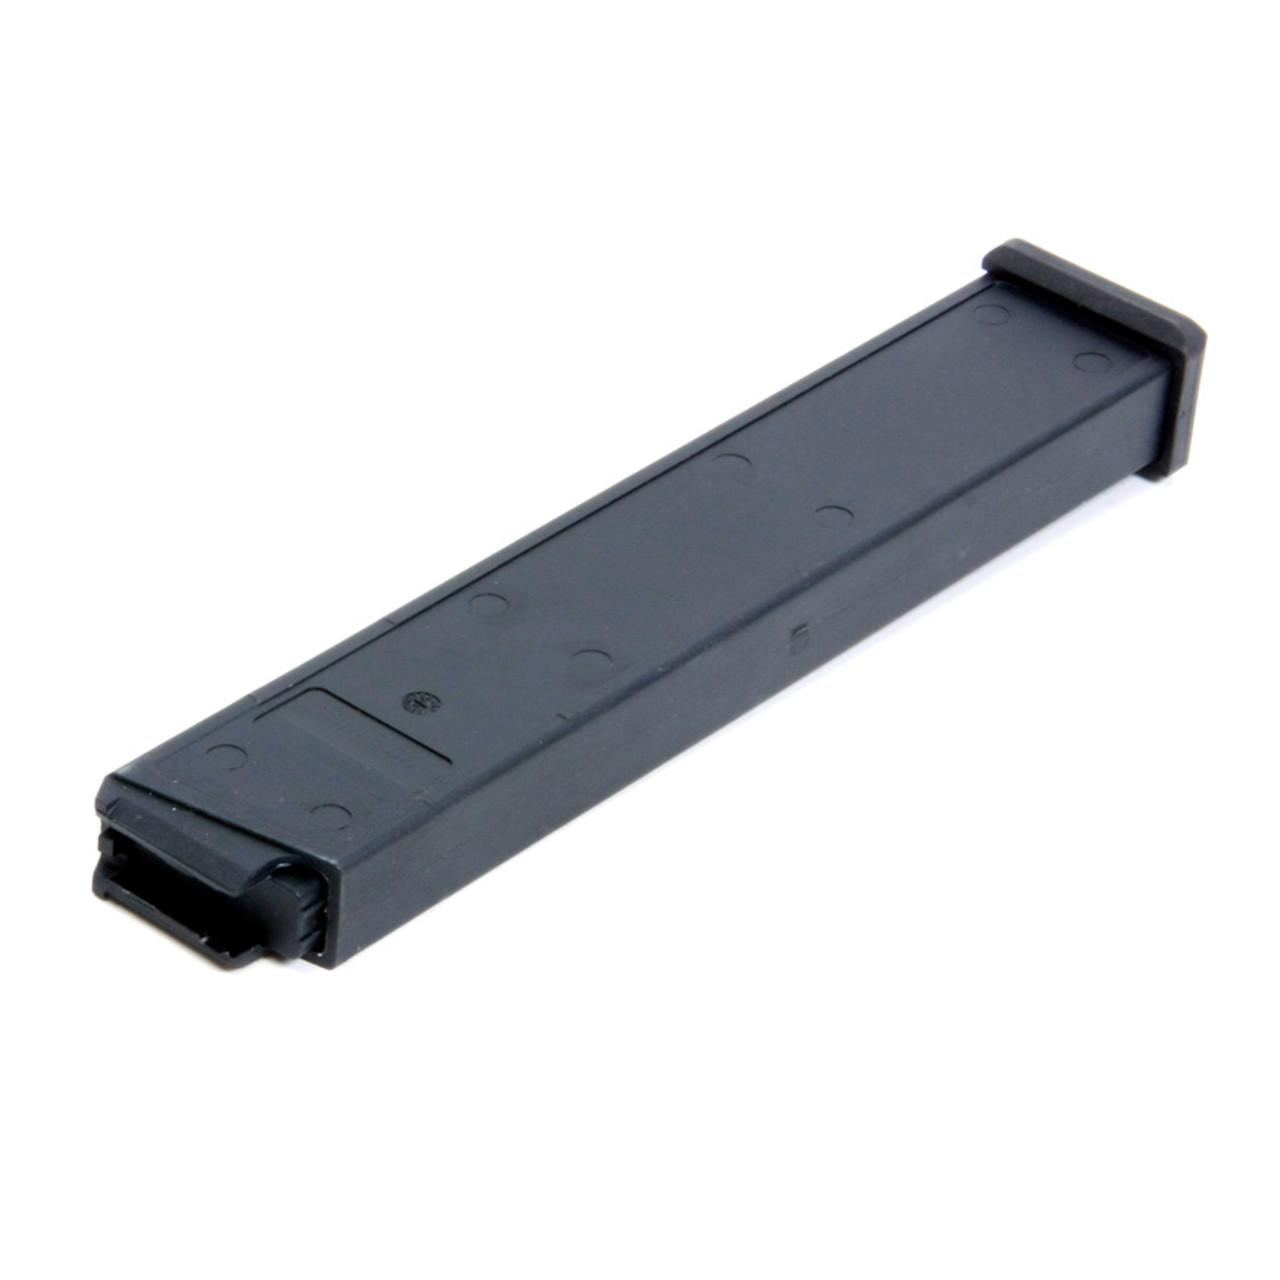 HK® USC .45 ACP Carbine (15) Rd - Black Polymer